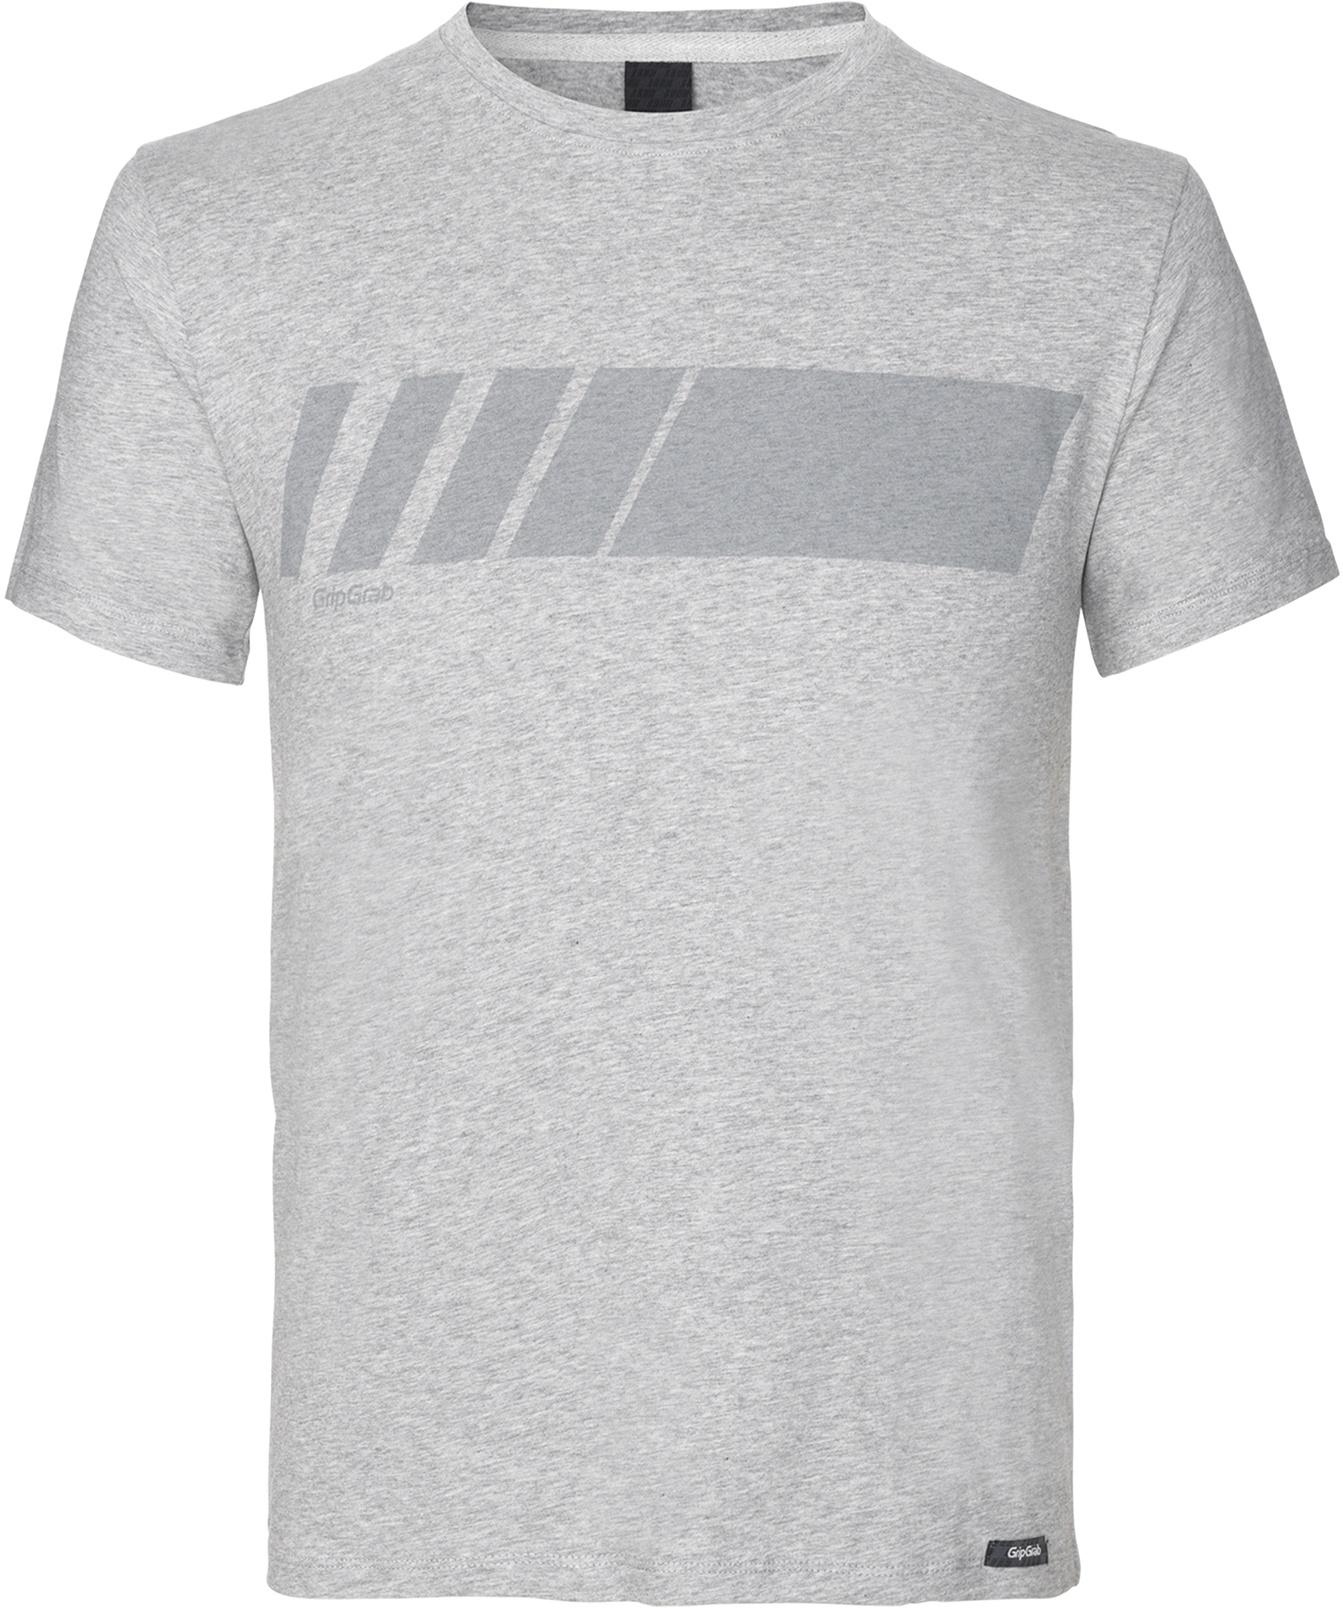 GripGrab Racing Stripe Kortærmet Økologisk Bomulds-T-shirt - Grå